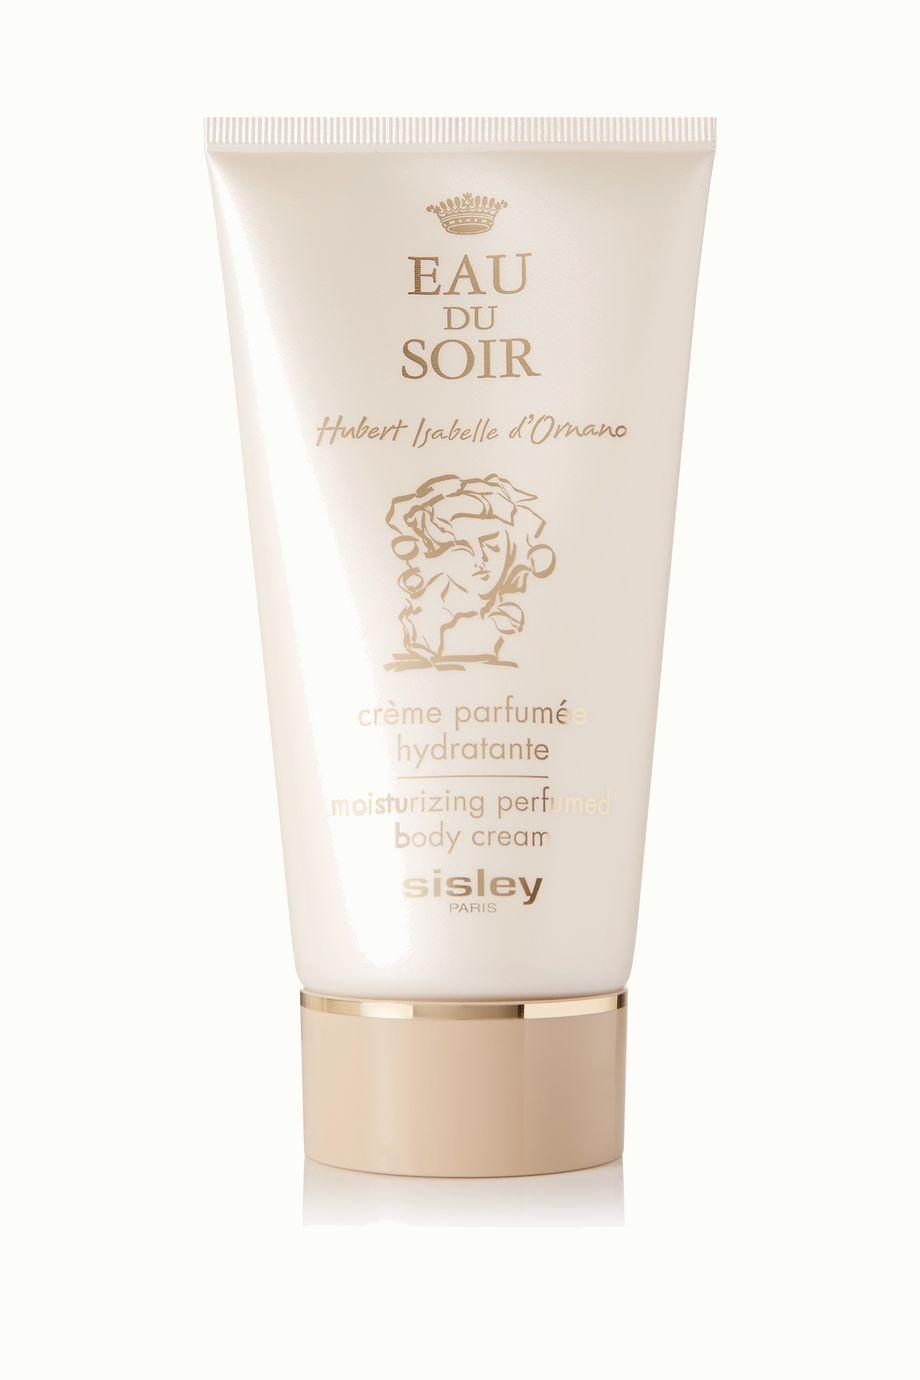 Sisley Eau du Soir Moisturizing Perfumed Body Cream, 150ml